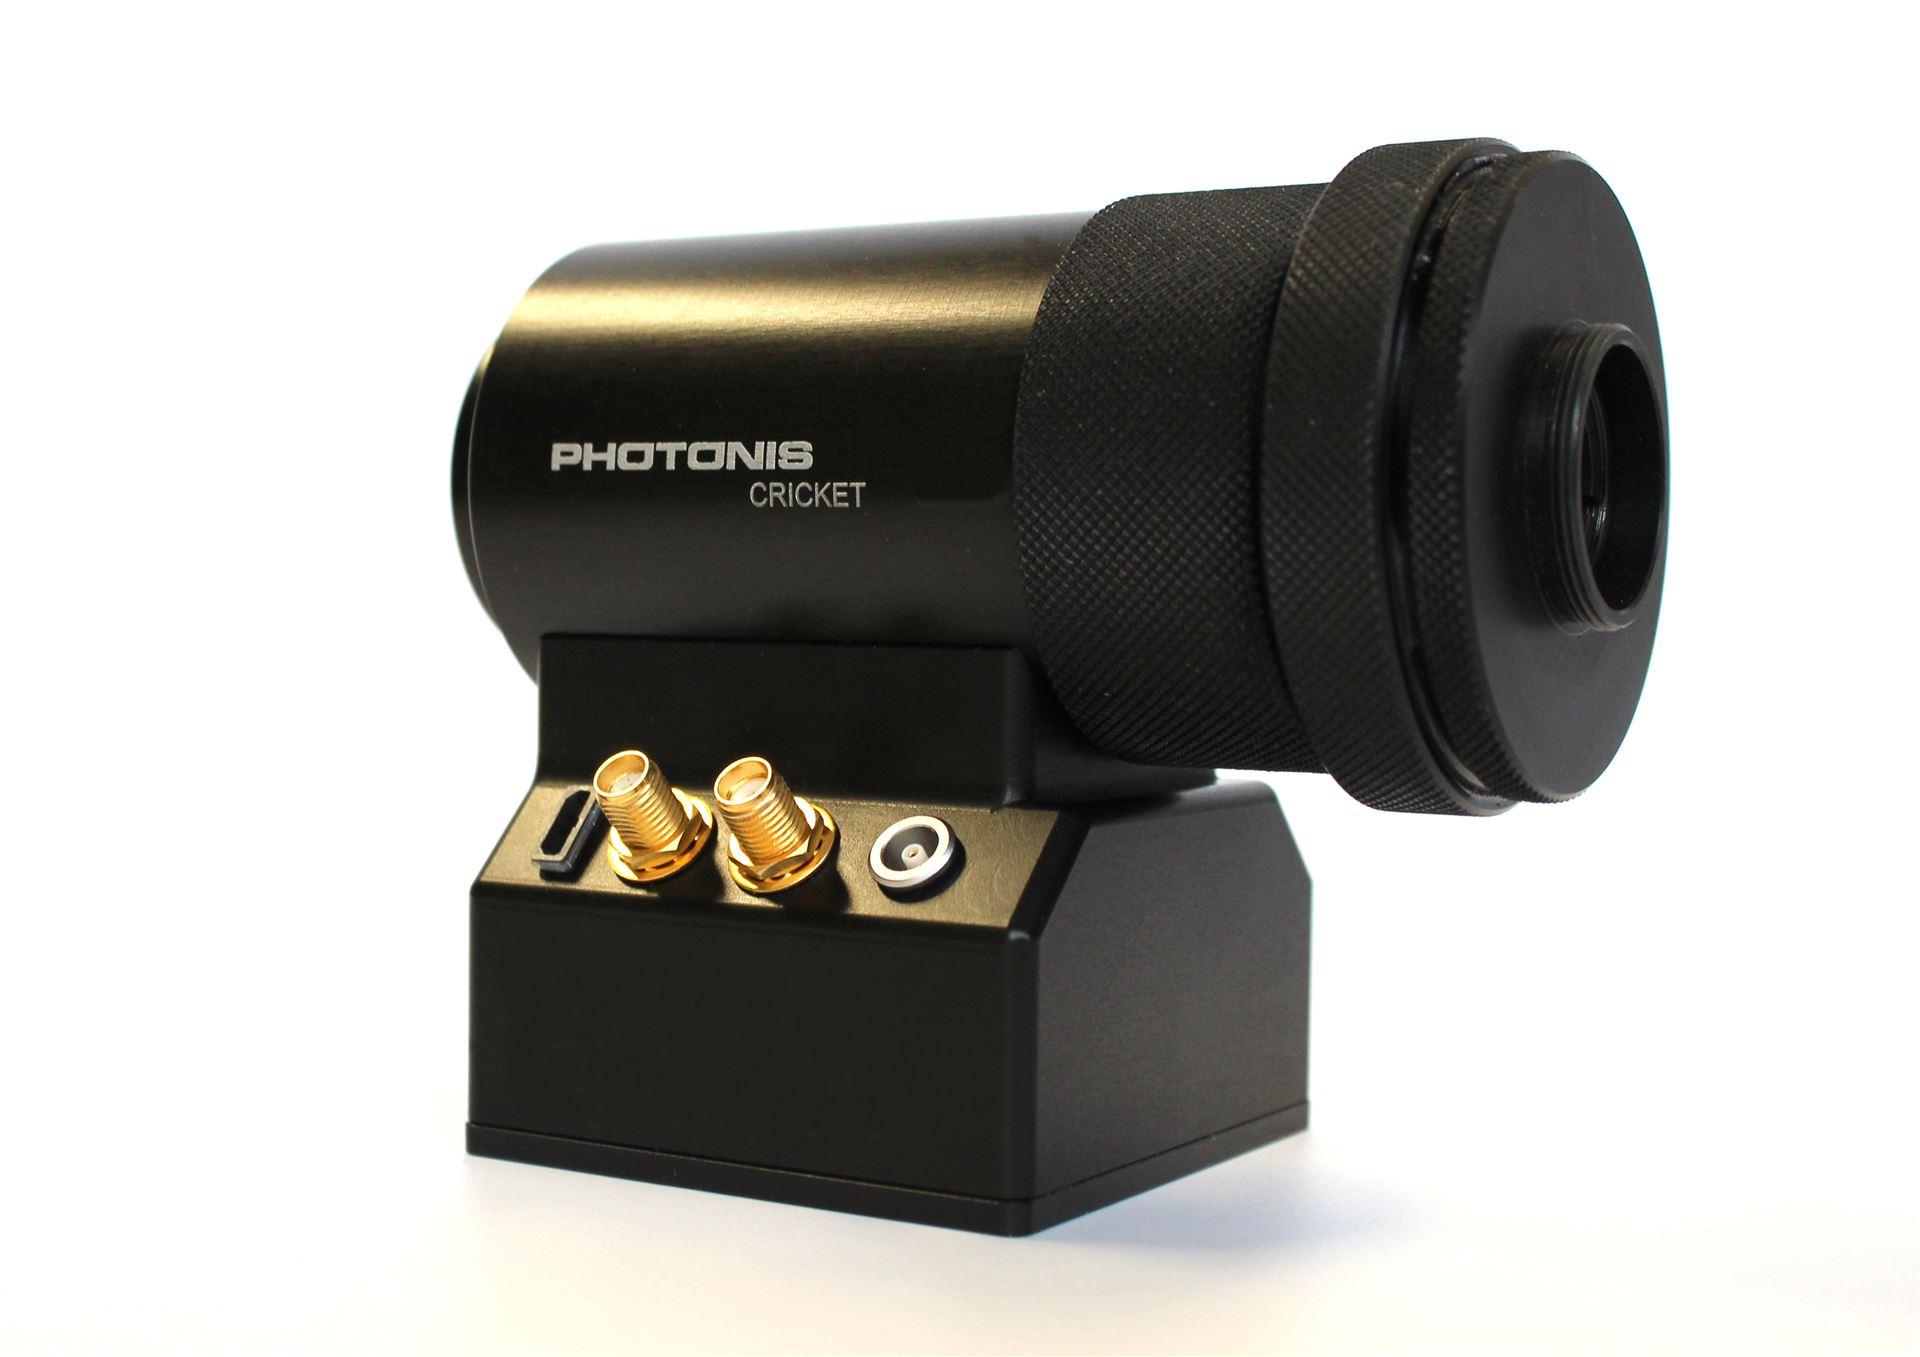 Cricket: A lens coupling camera attachment